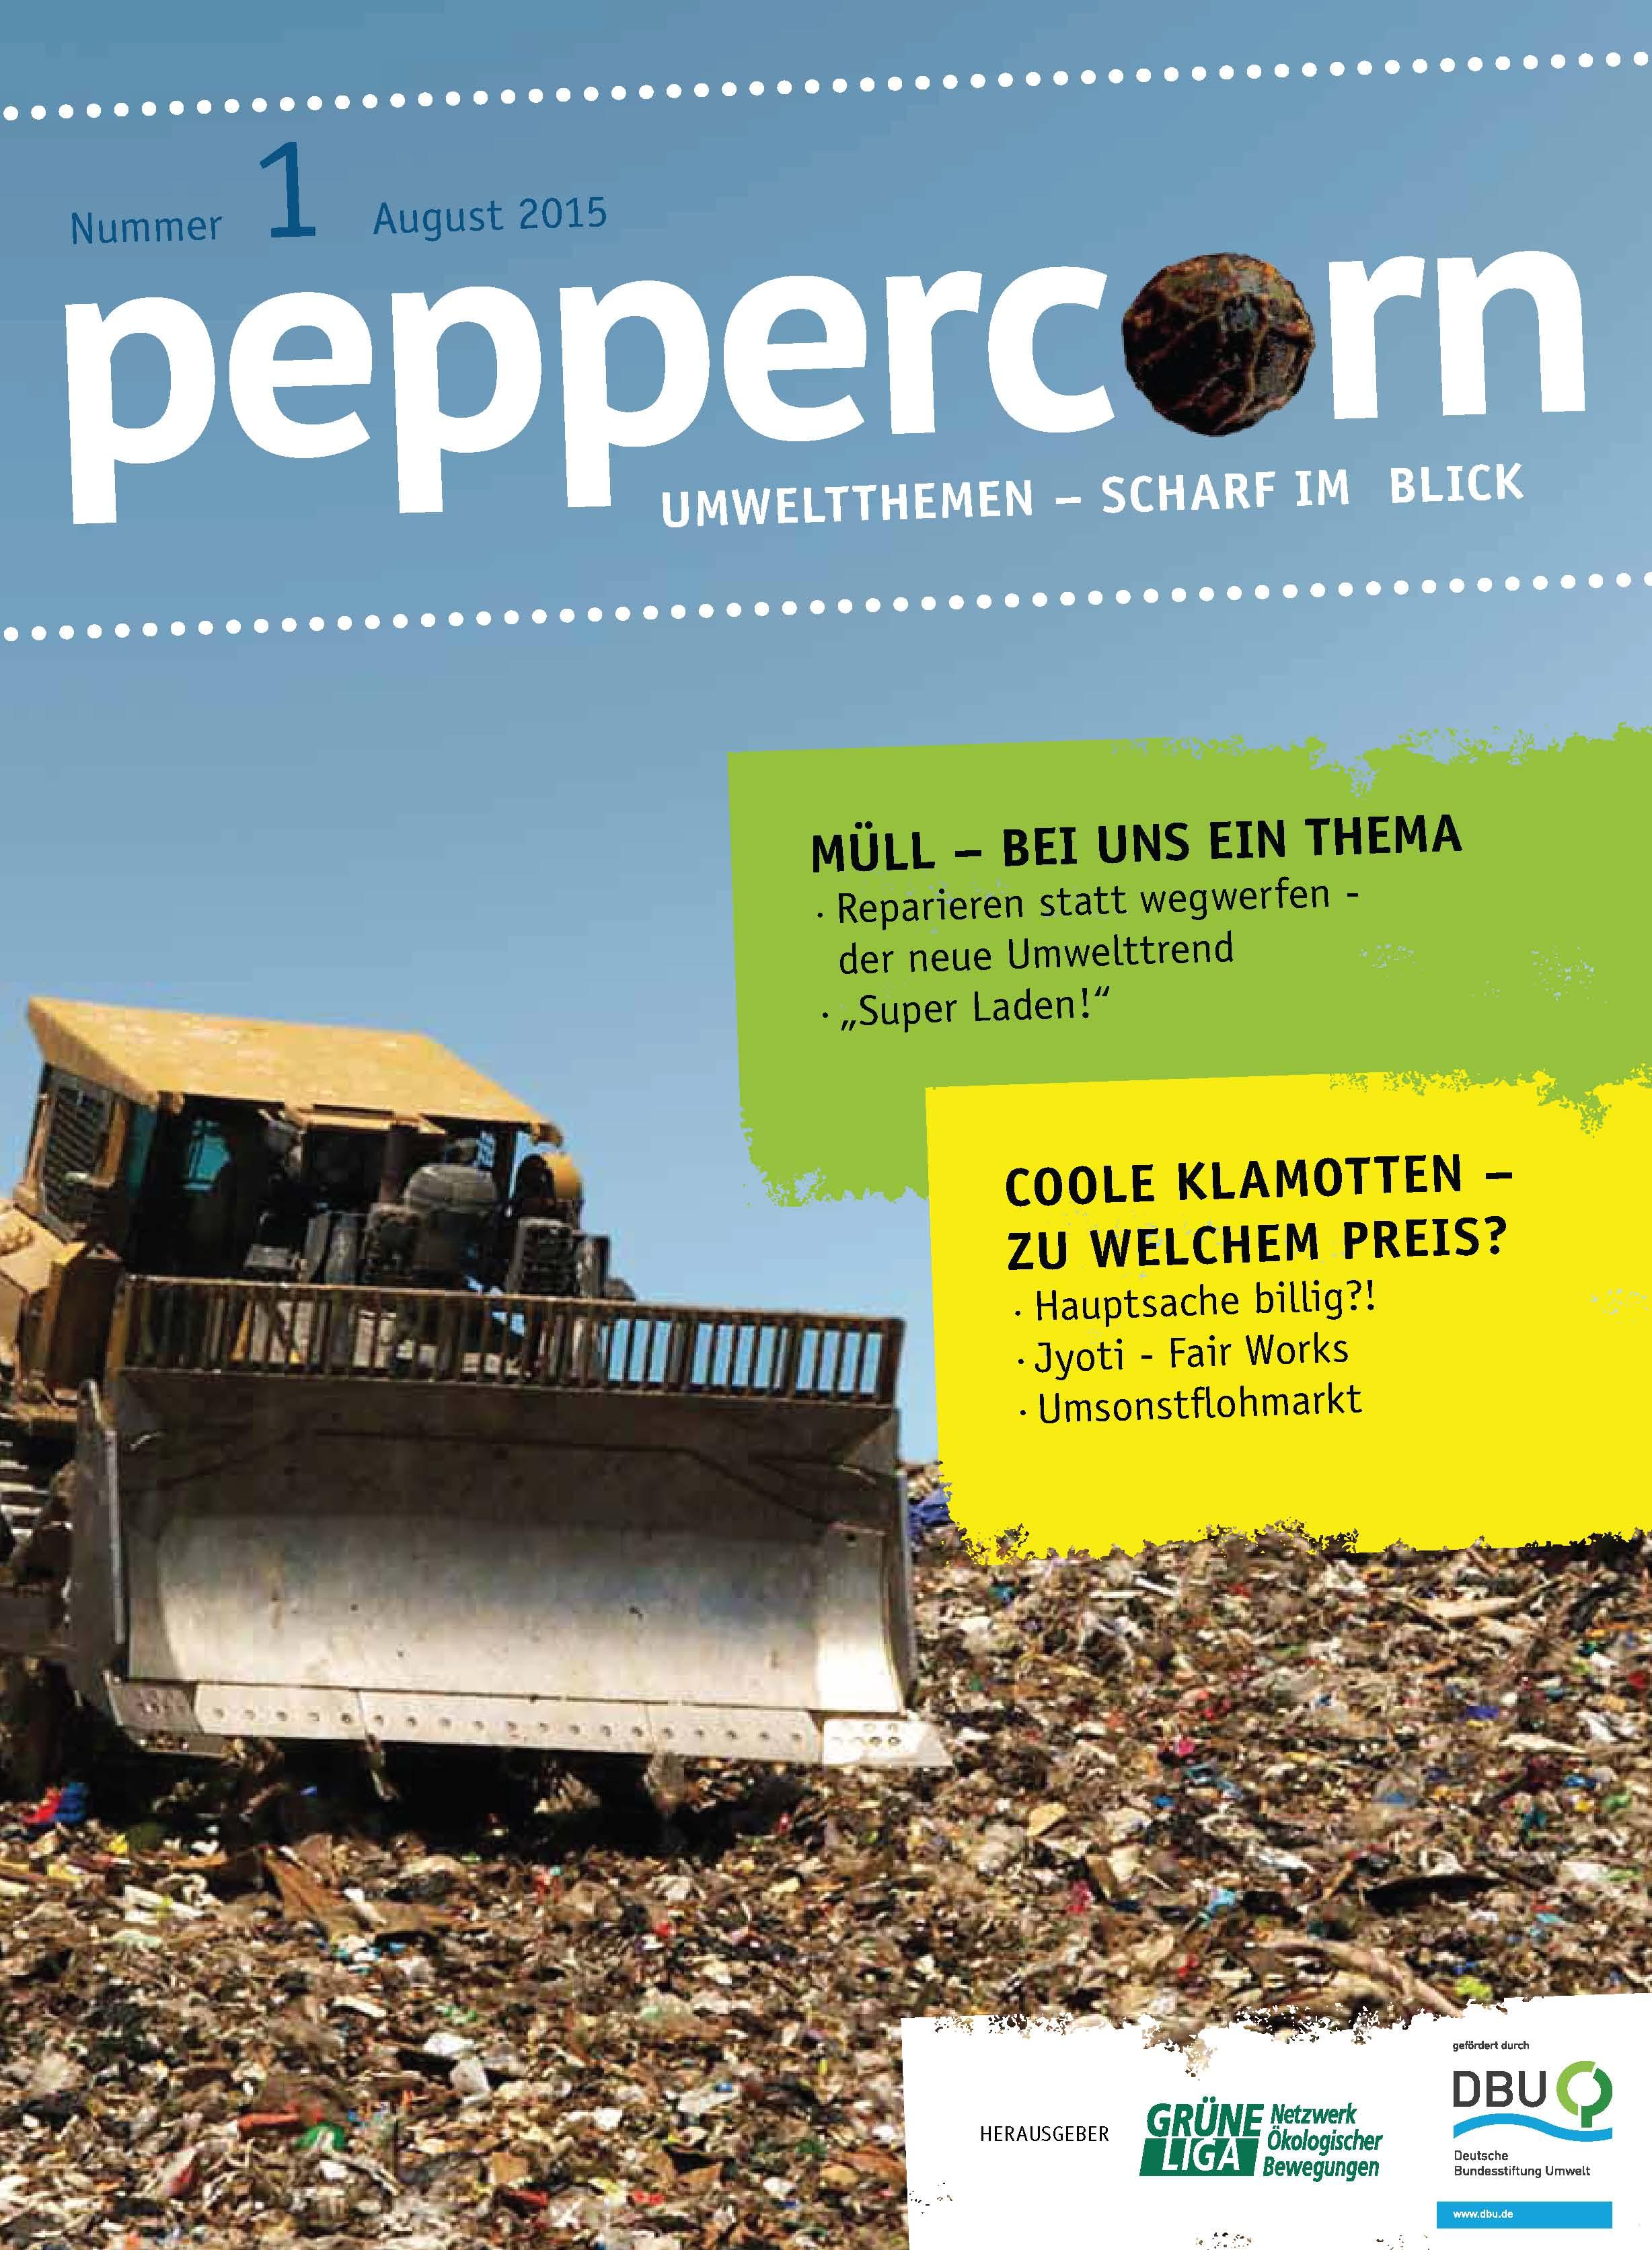 peppercorn umweltthemen scharf im blick gr ne liga berlin e v netzwerk kologischer bewegungen. Black Bedroom Furniture Sets. Home Design Ideas